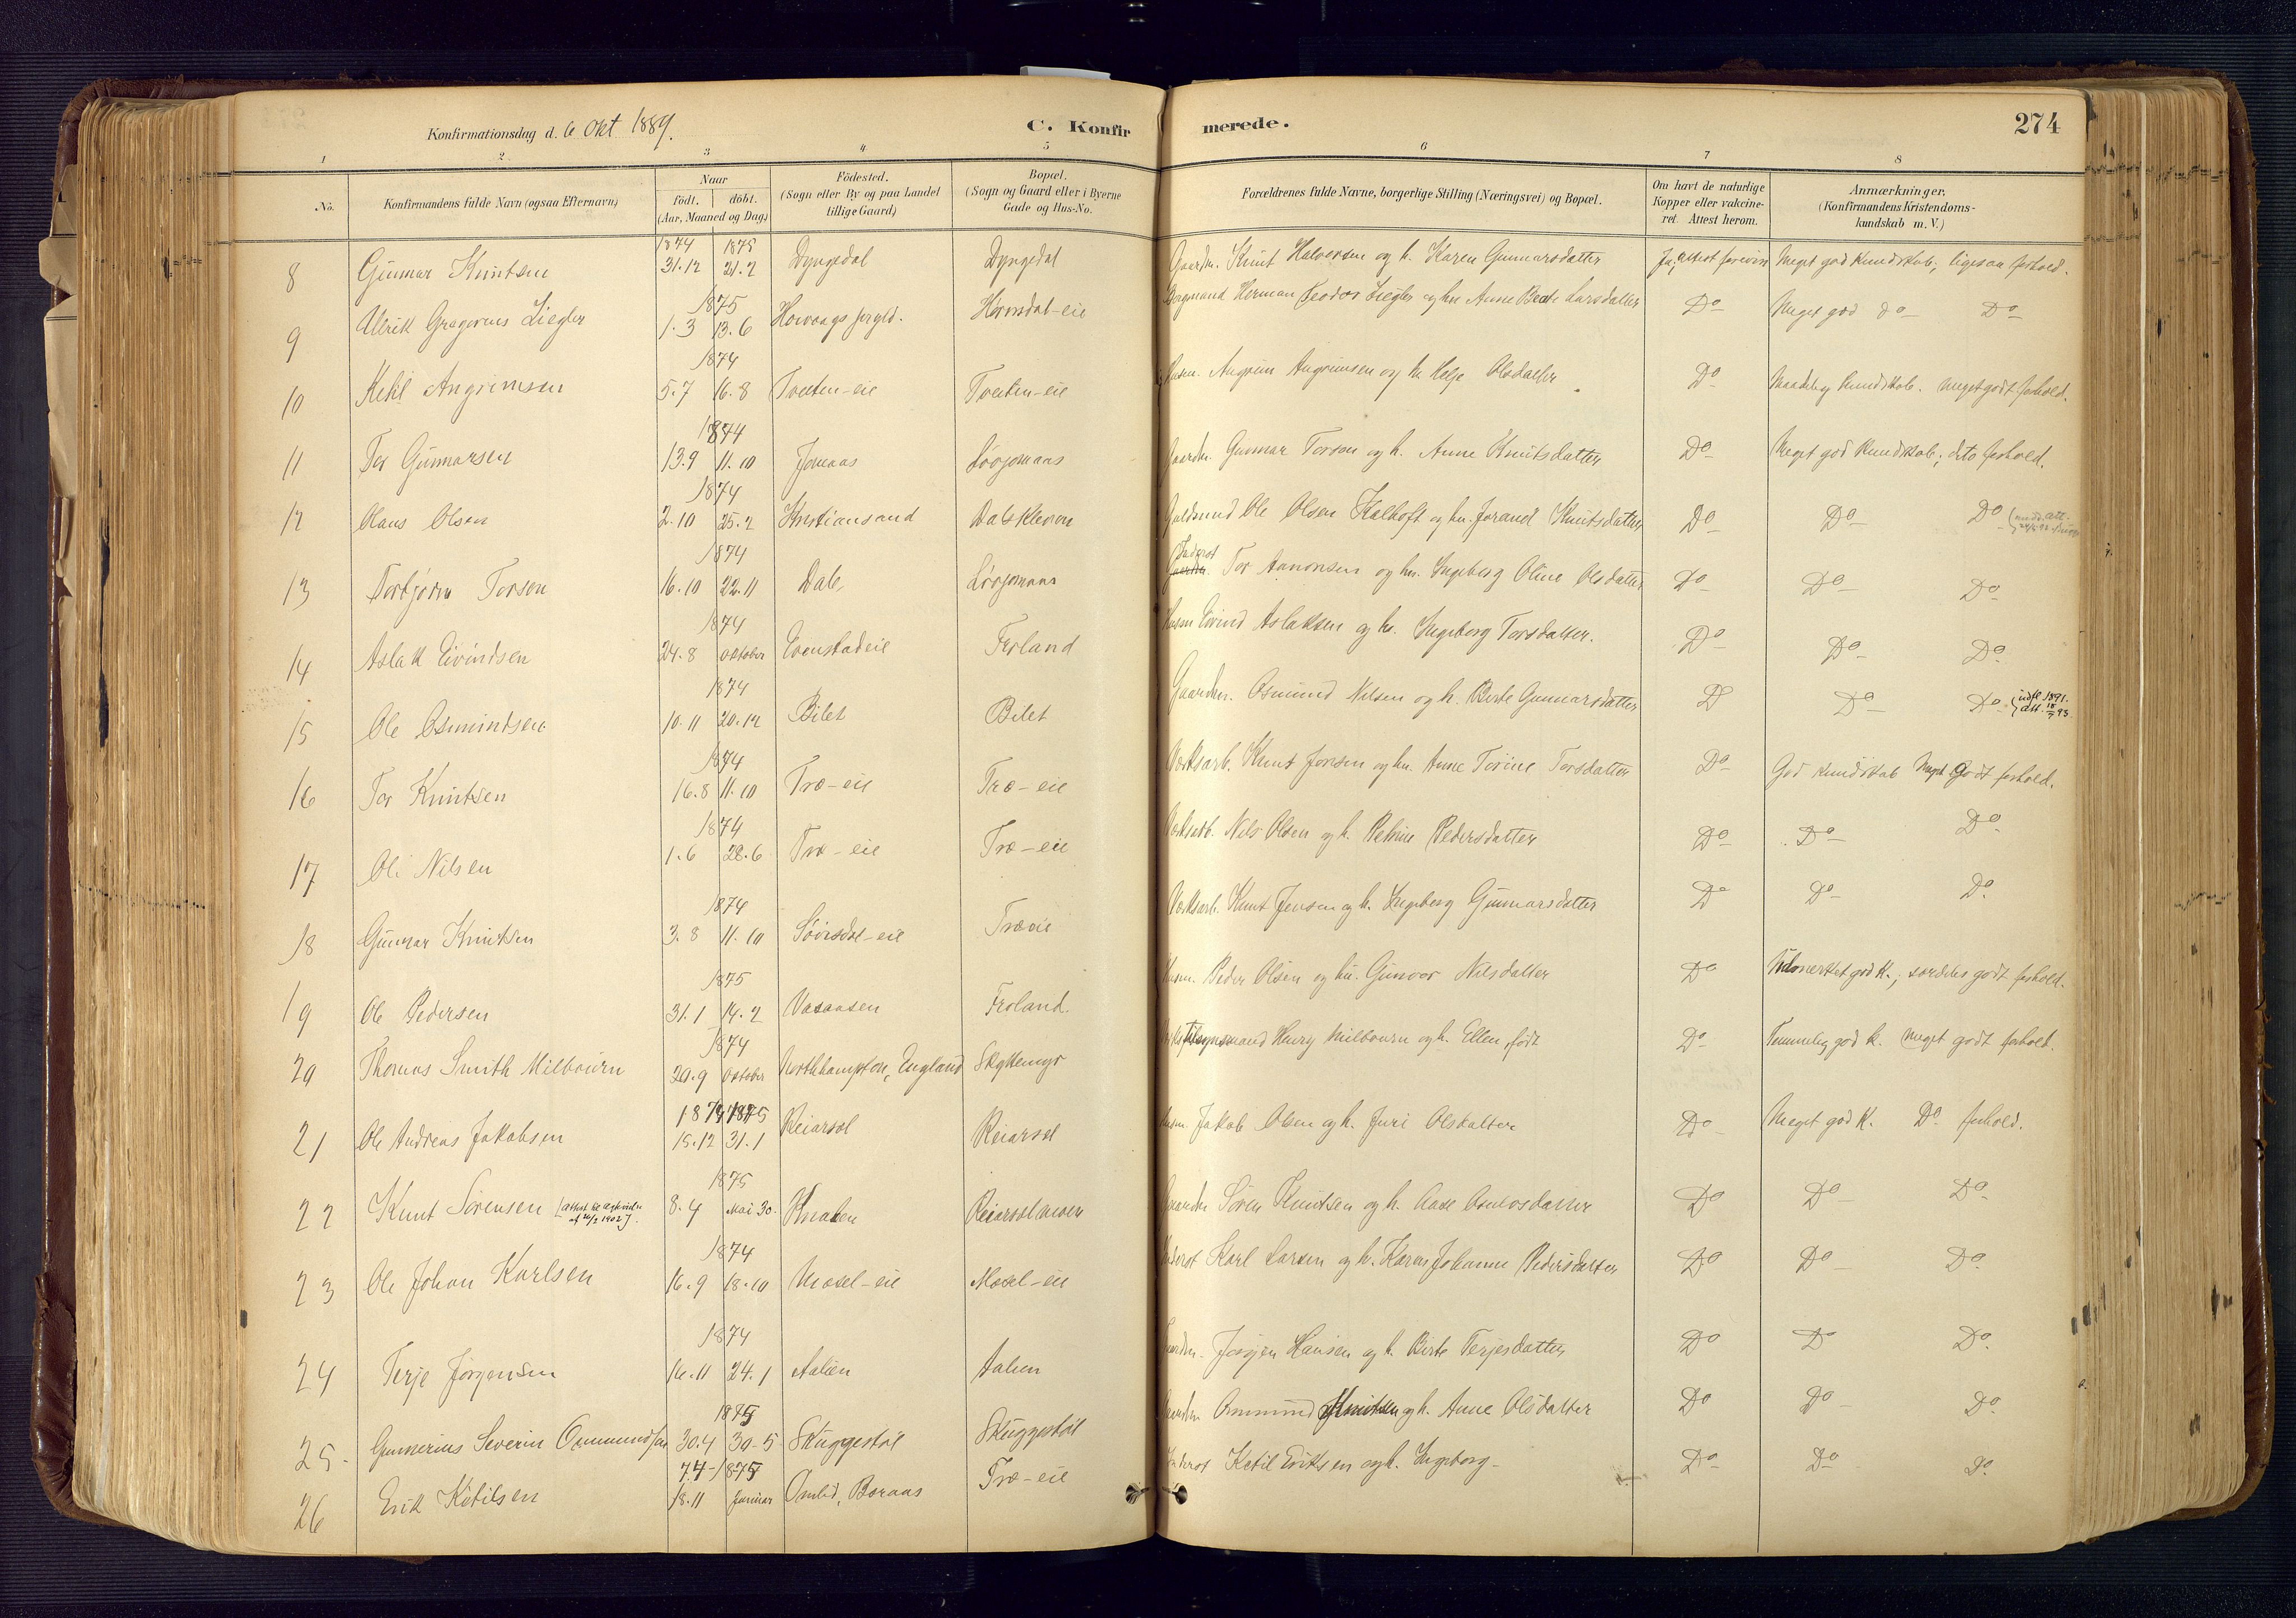 SAK, Froland sokneprestkontor, F/Fa/L0005: Ministerialbok nr. A 5, 1882-1921, s. 274